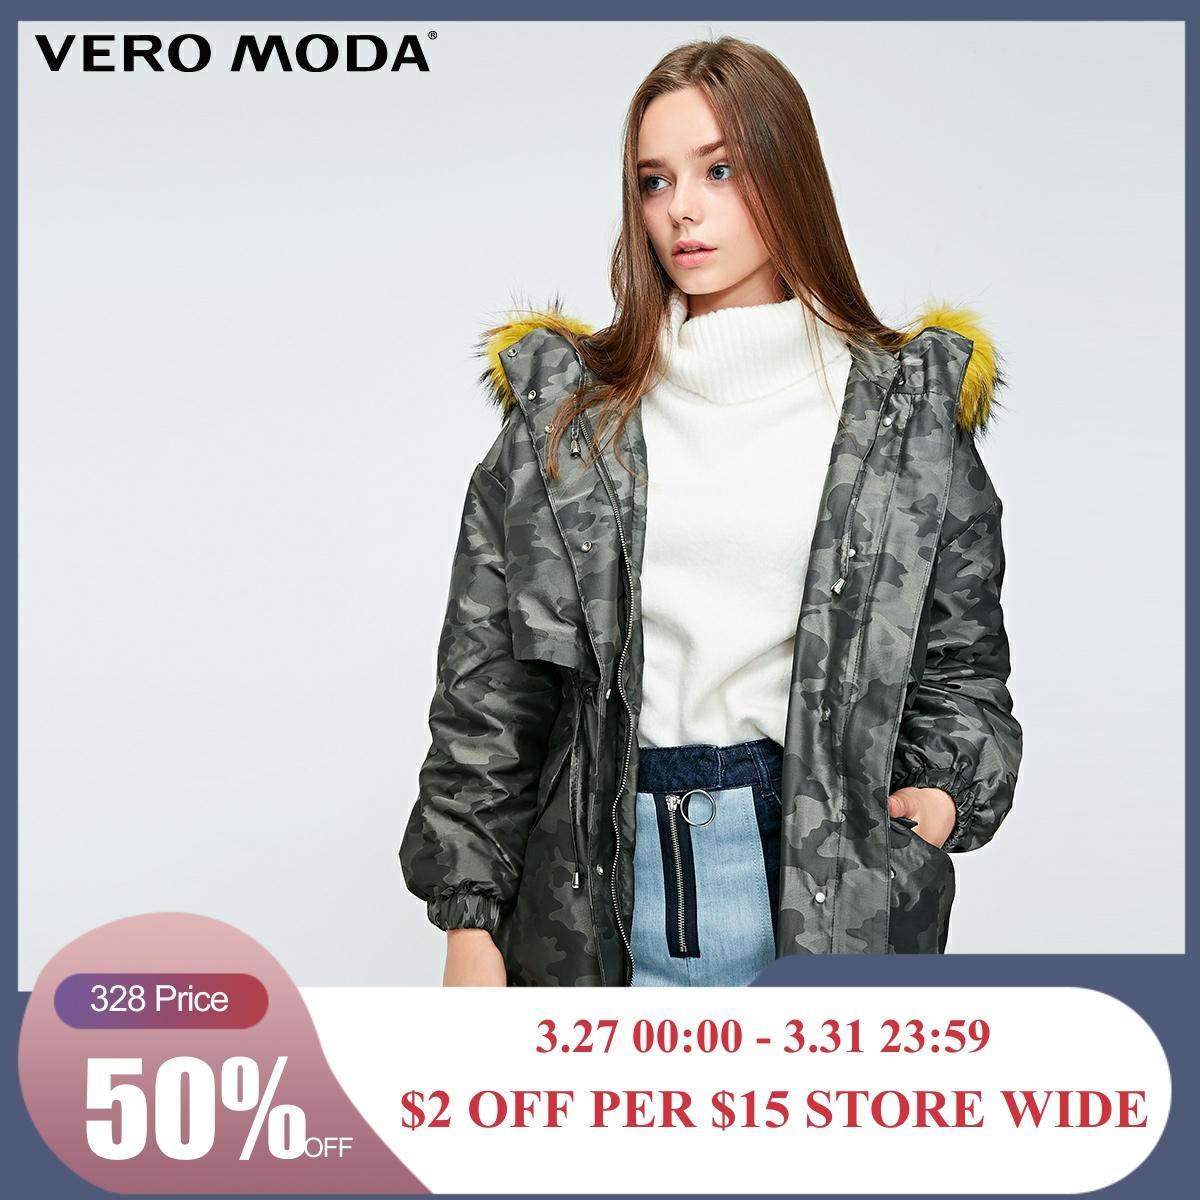 Vero Moda New 90% White Duck Down Raccoon Fur Hooded Camouflage Down Parka Coat | 318412535